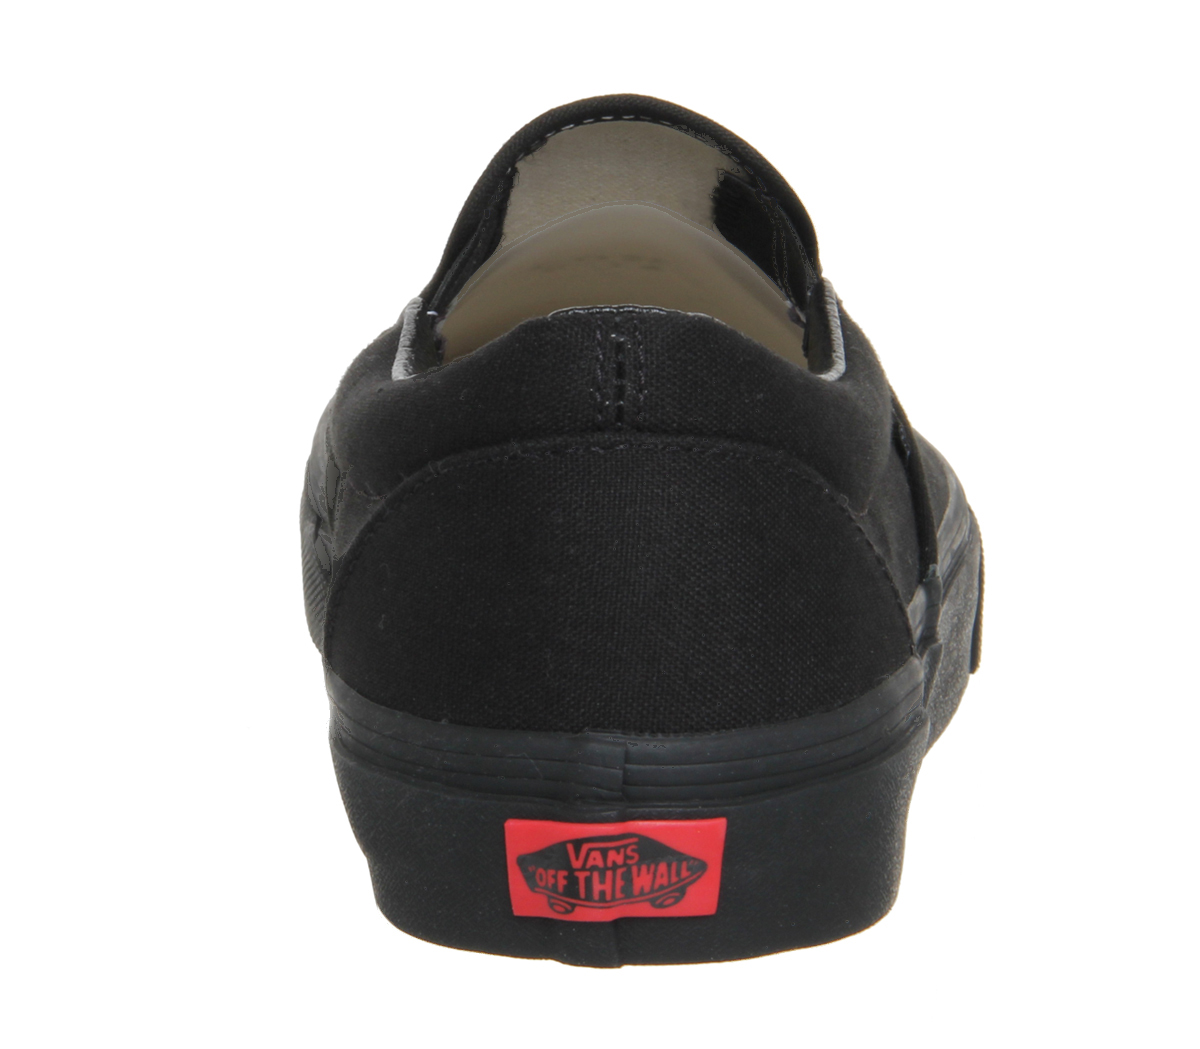 Herren Vans Classic Slip On Trainers BLACK MONO MONO BLACK Trainers Schuhes 8feee3